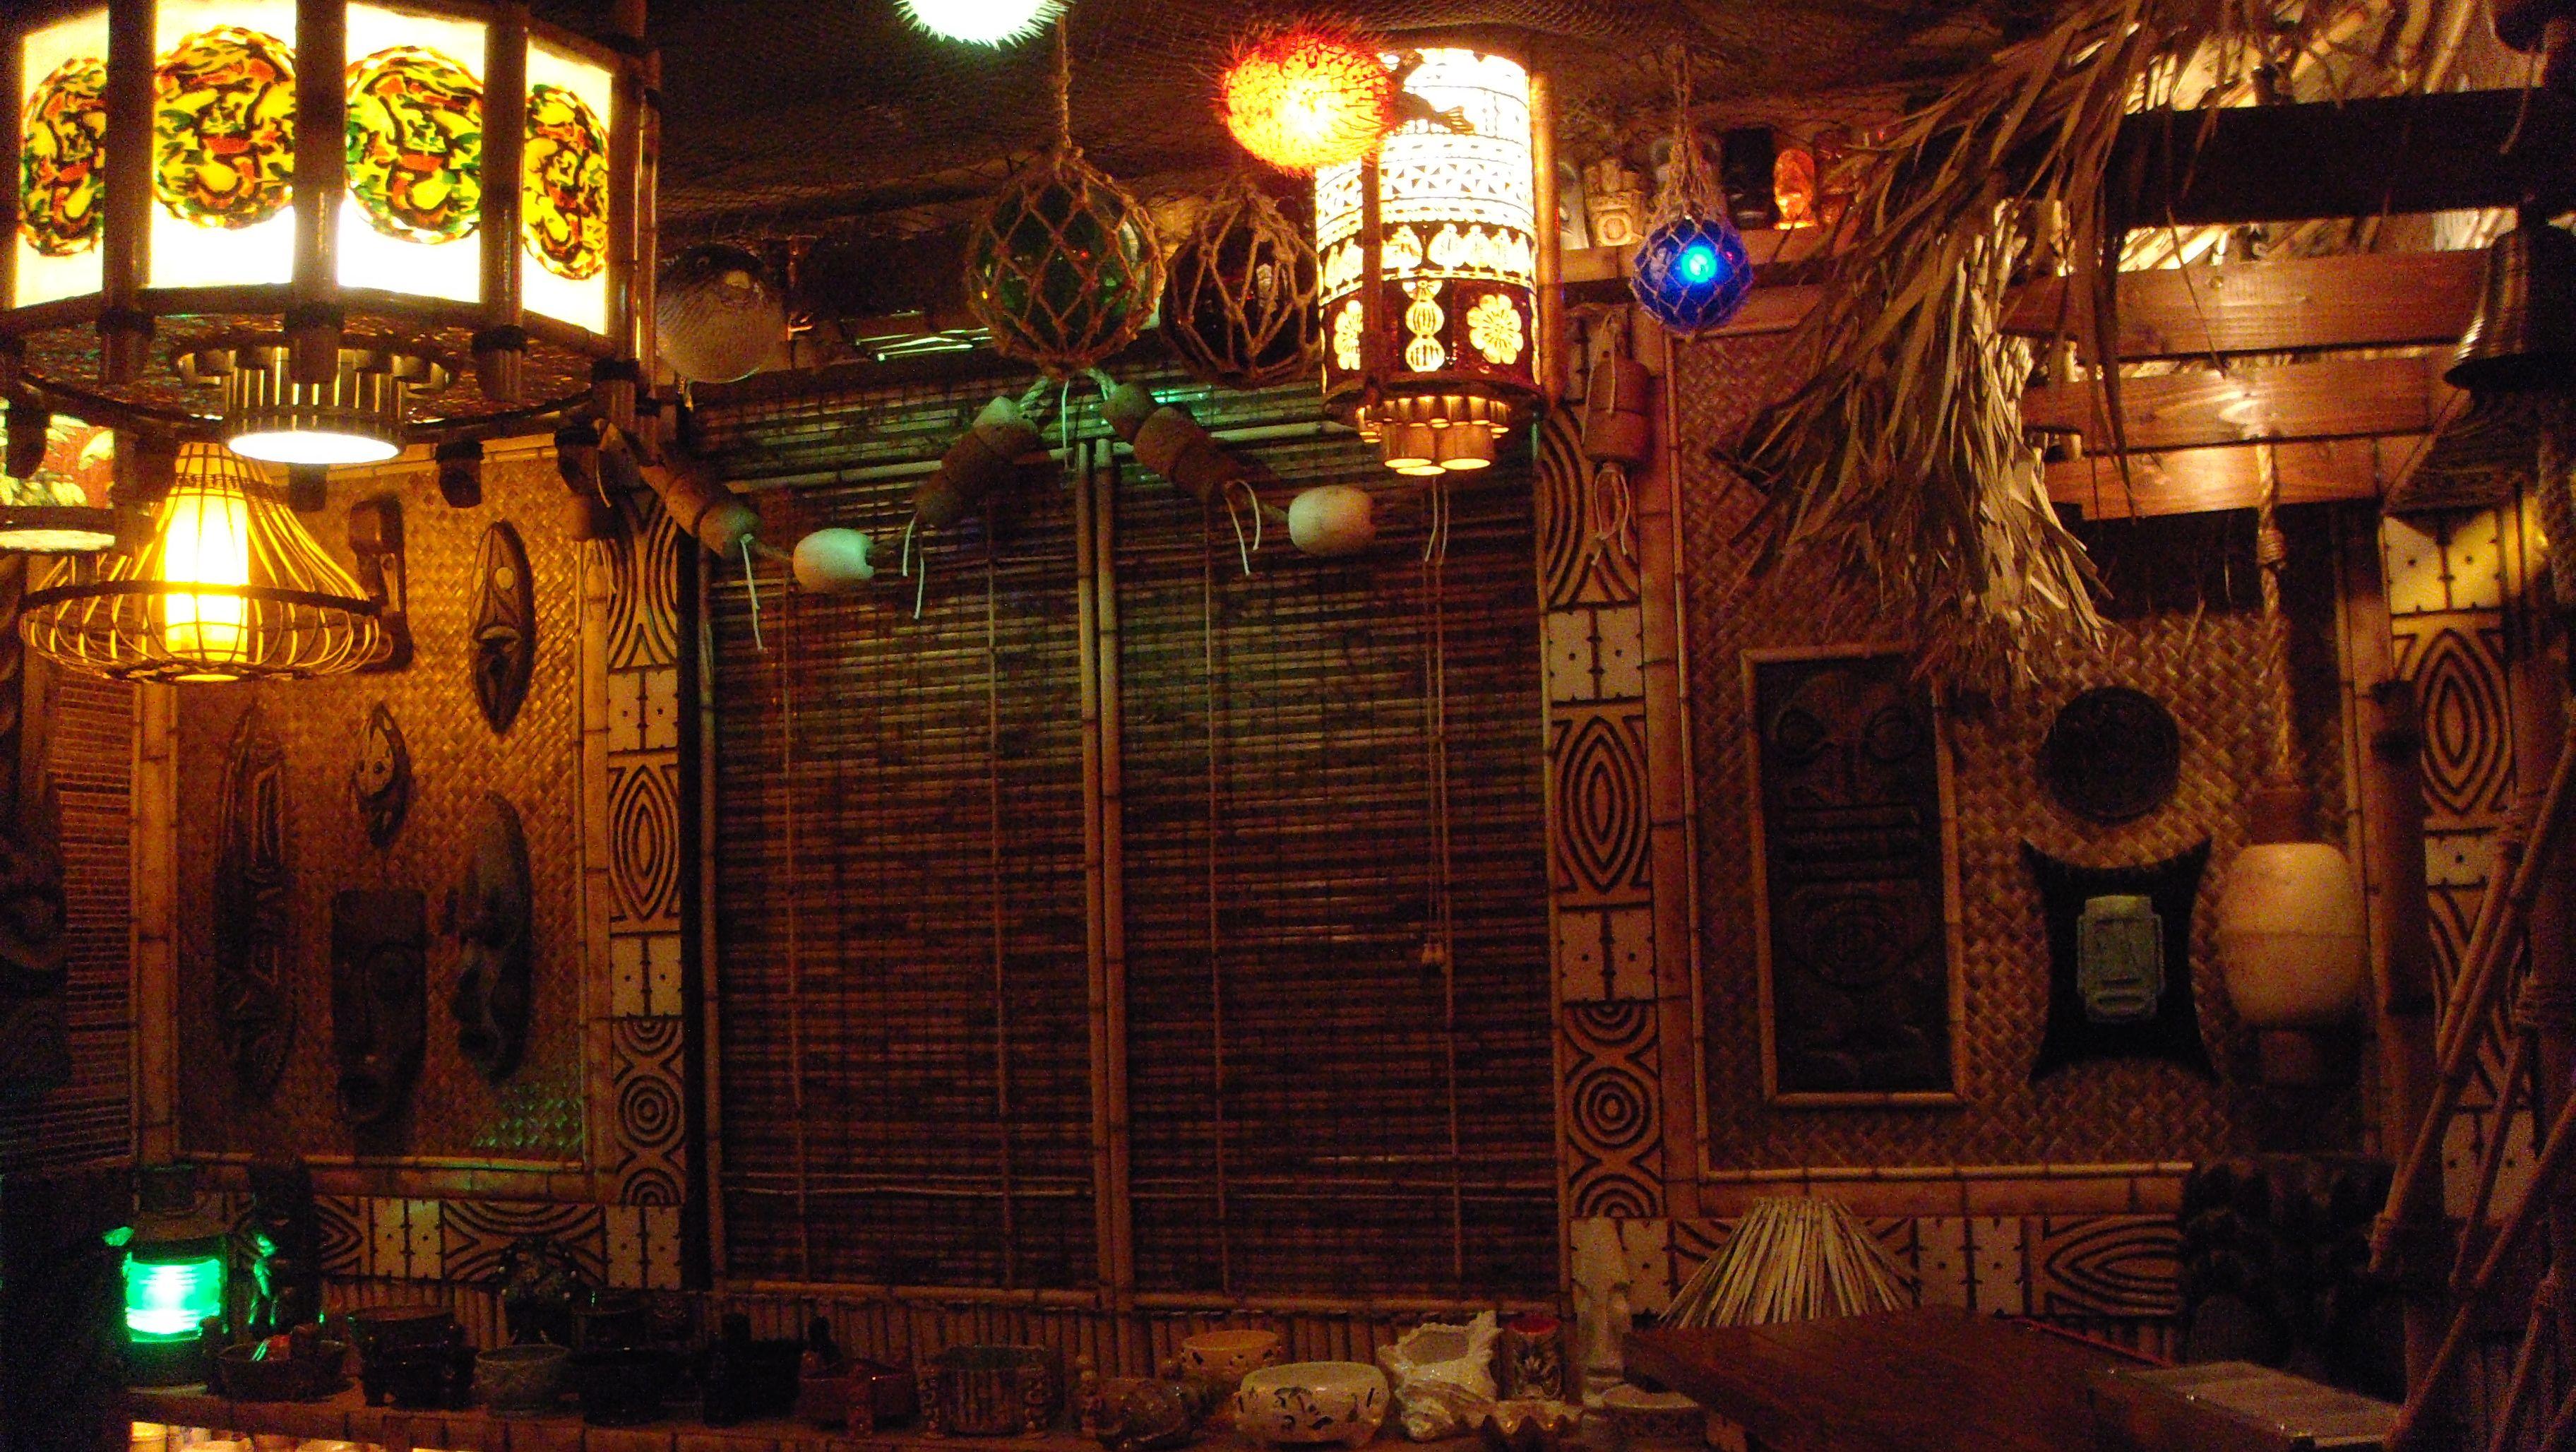 Tiki bar decor at home readers photos of their tiki for Tiki room decor